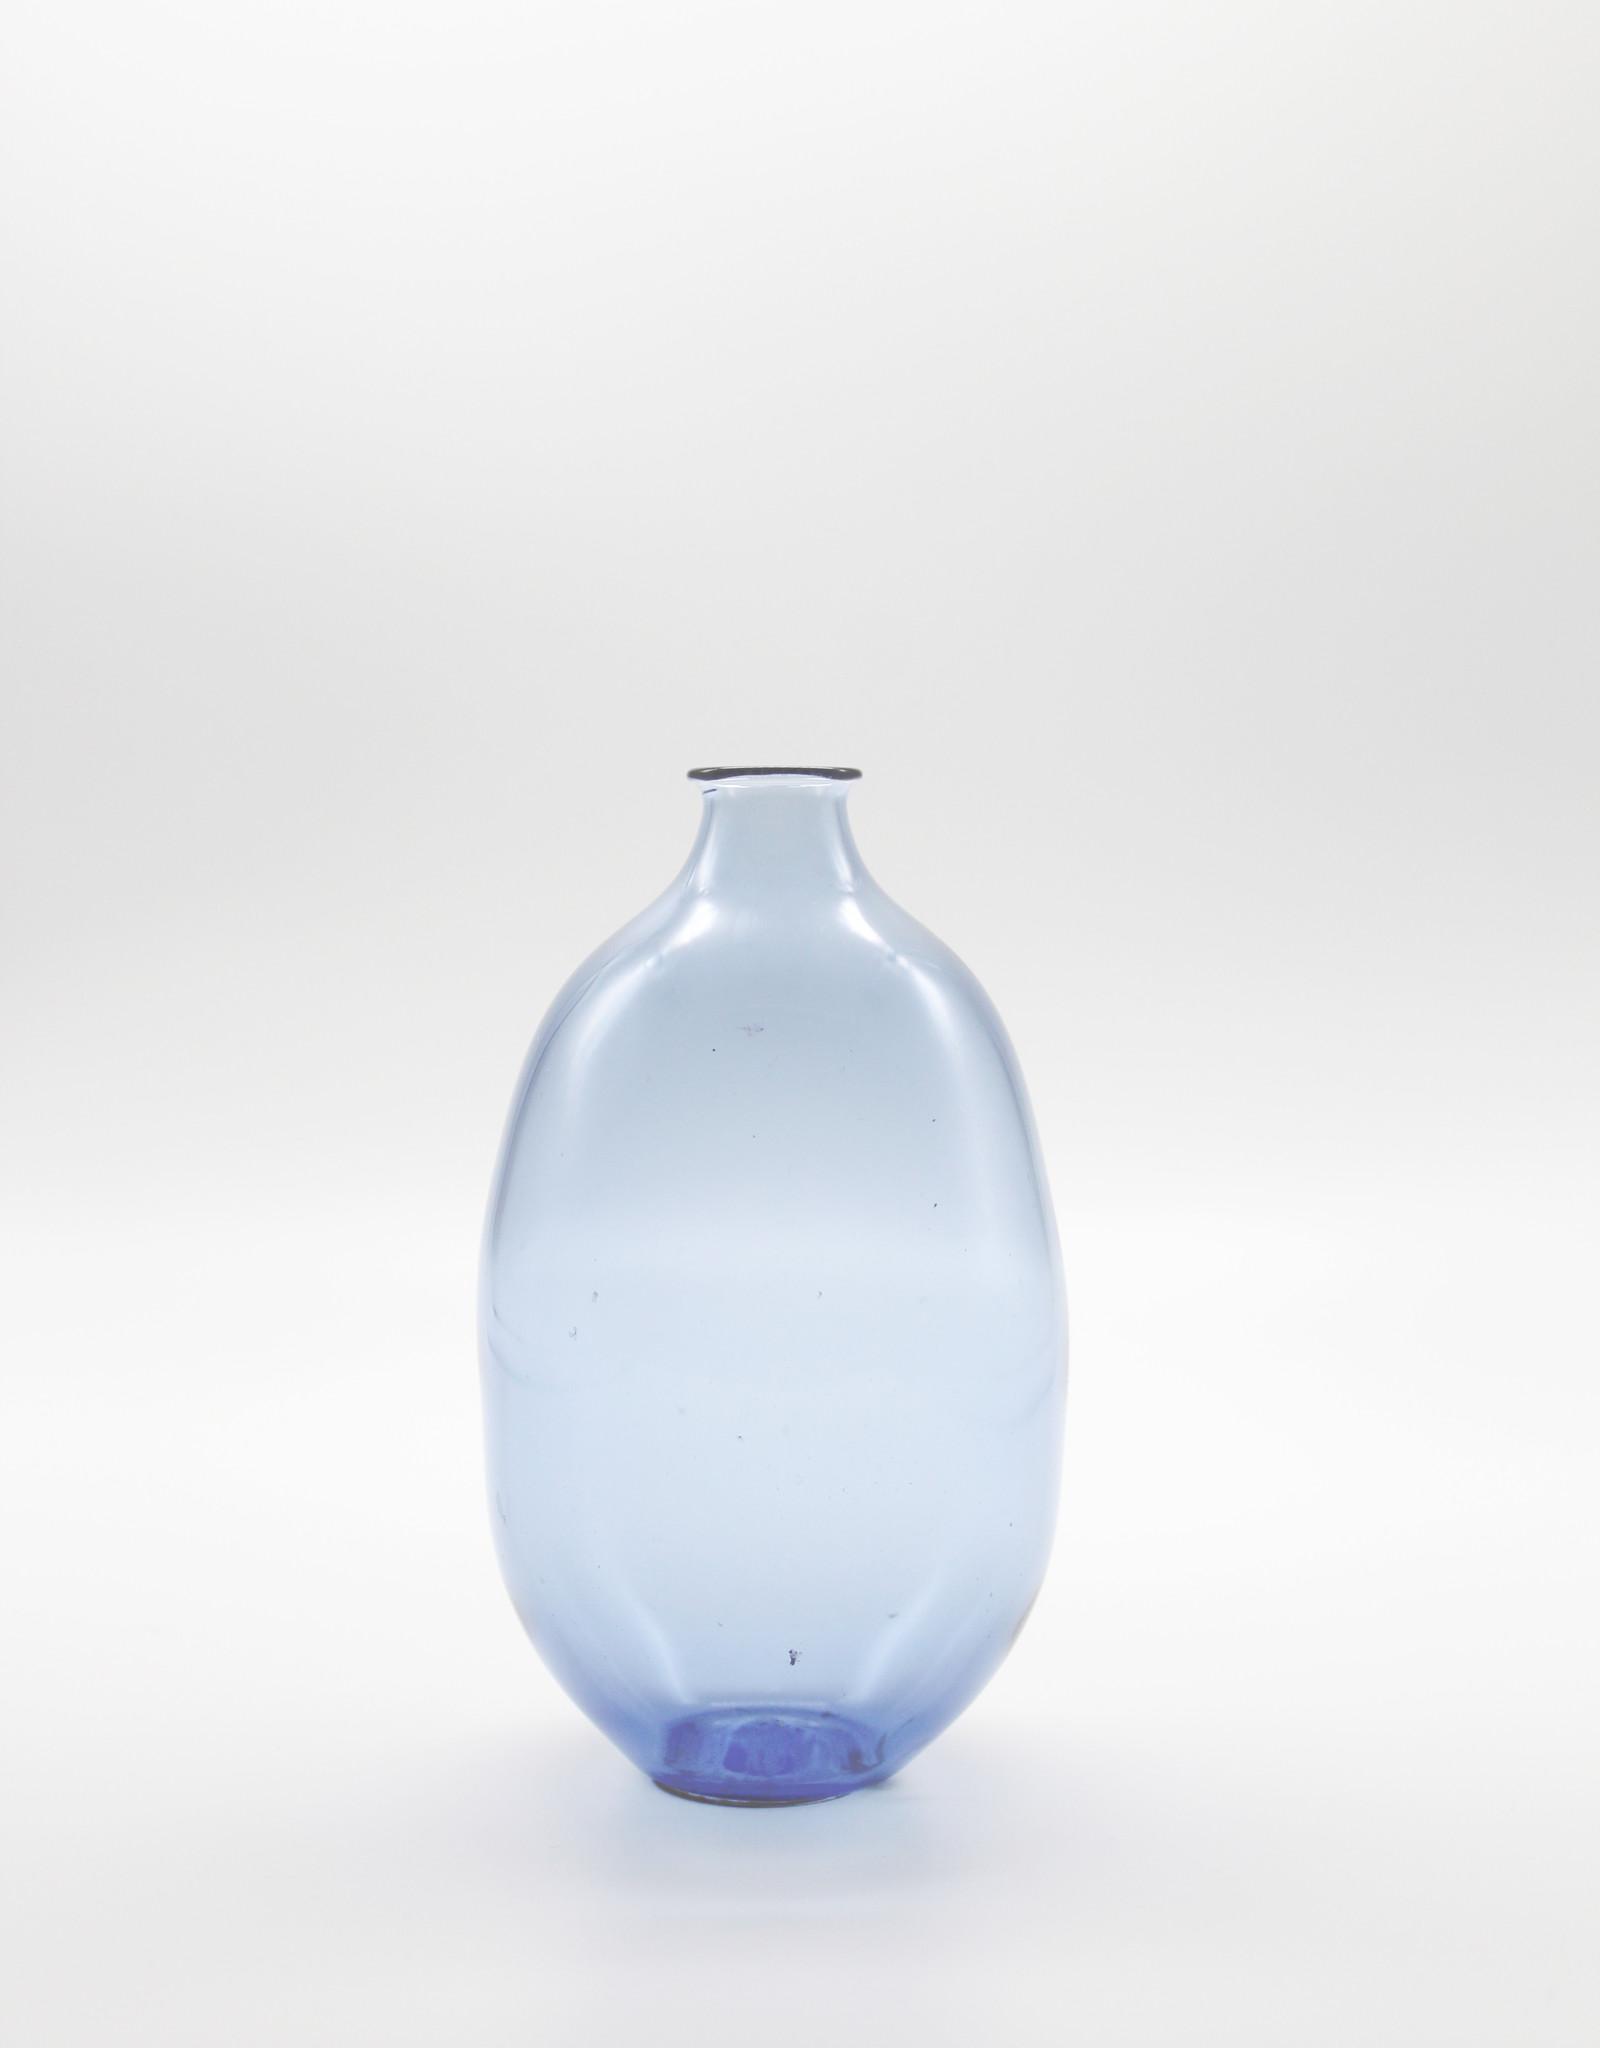 Quinn Harmon CQH07 Little Blue Vase